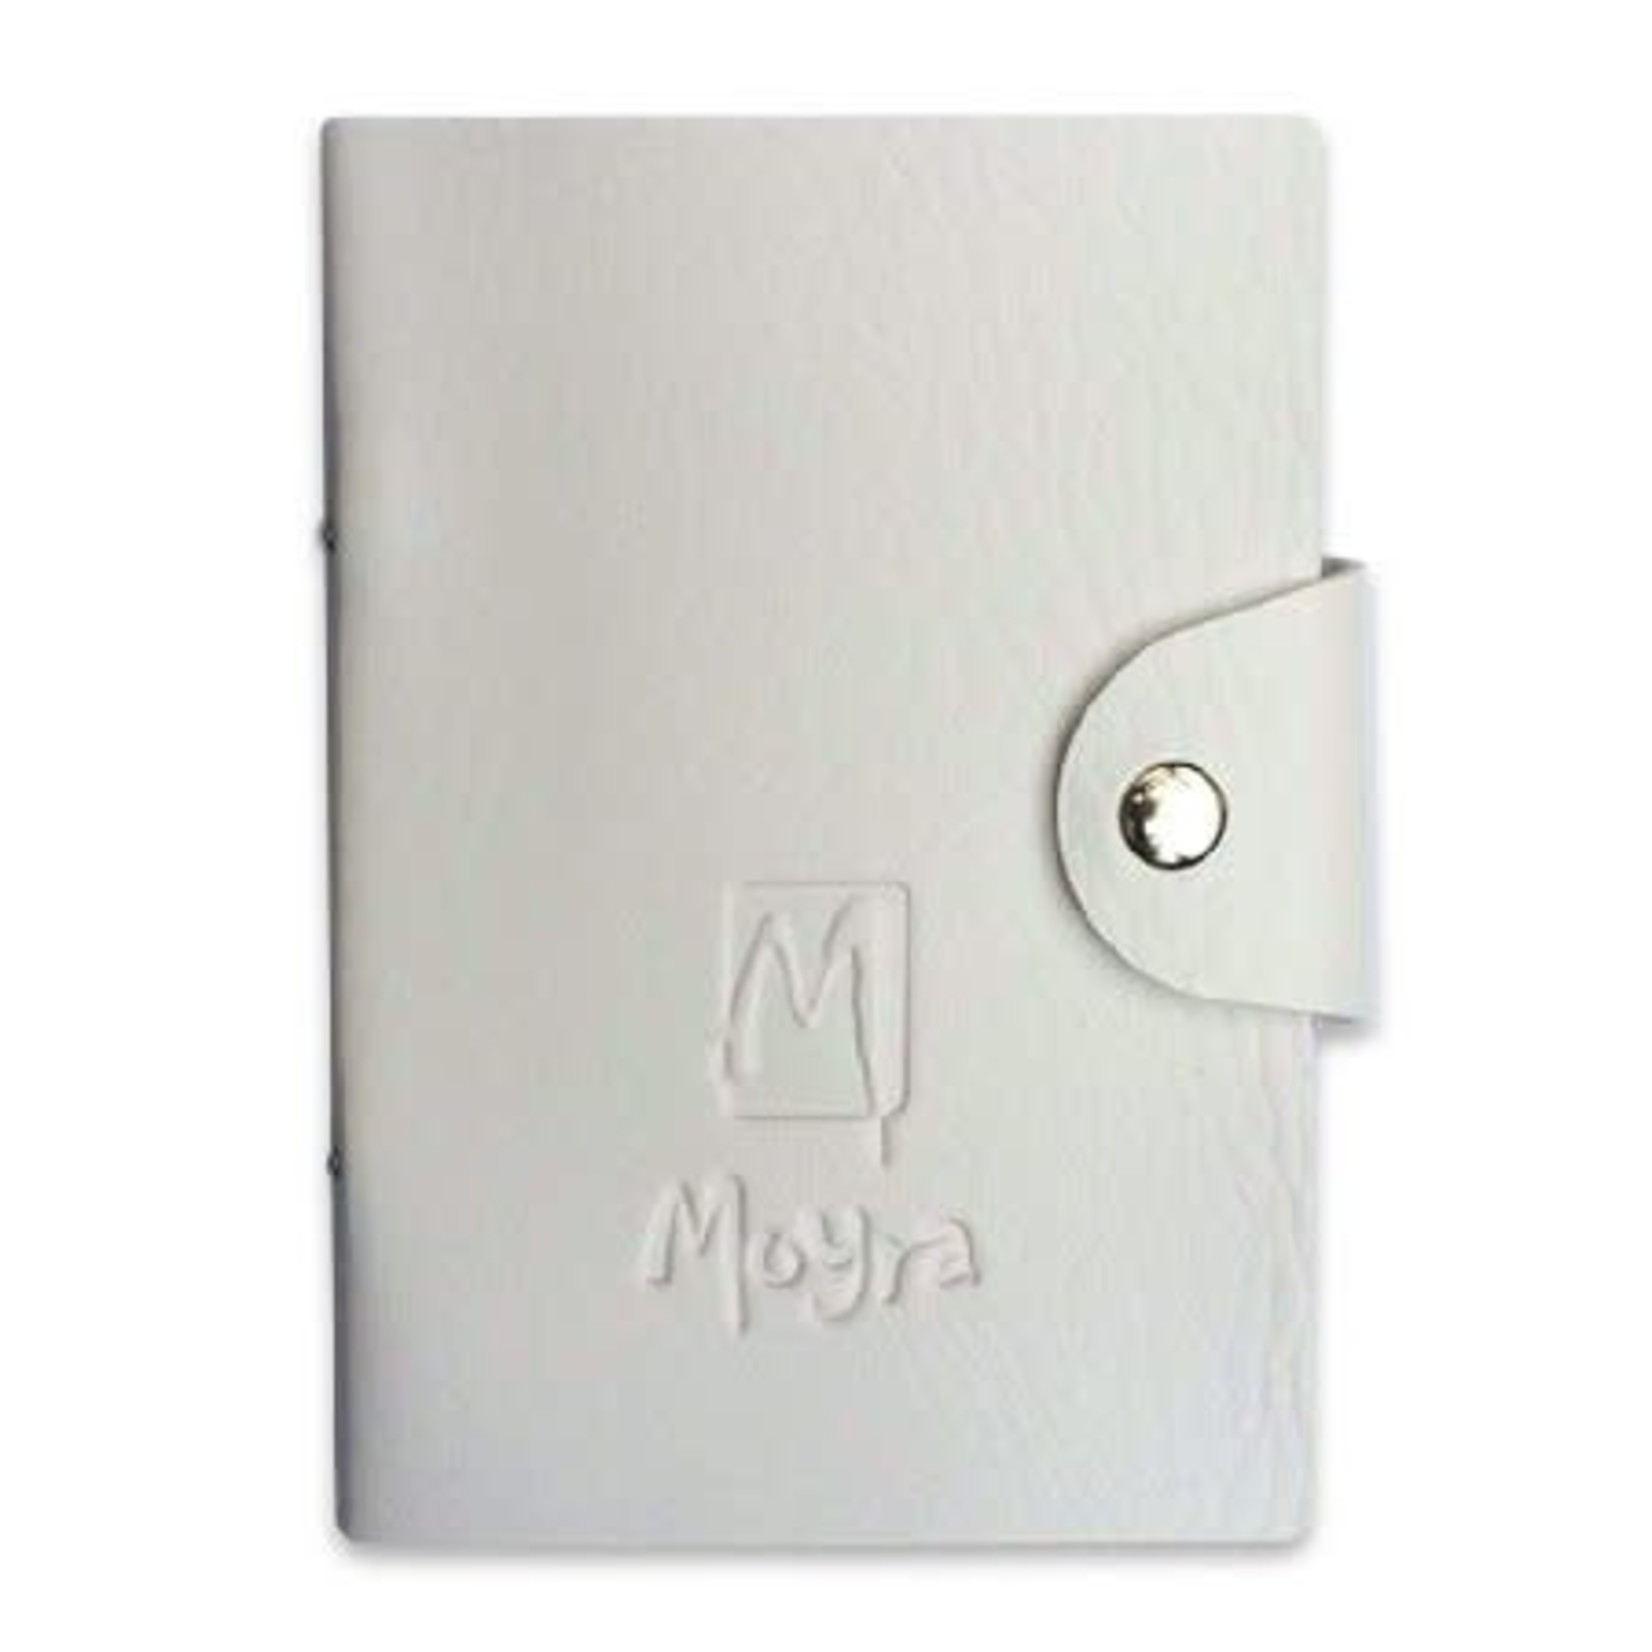 Moyra Moyra Stamping plate holder  white